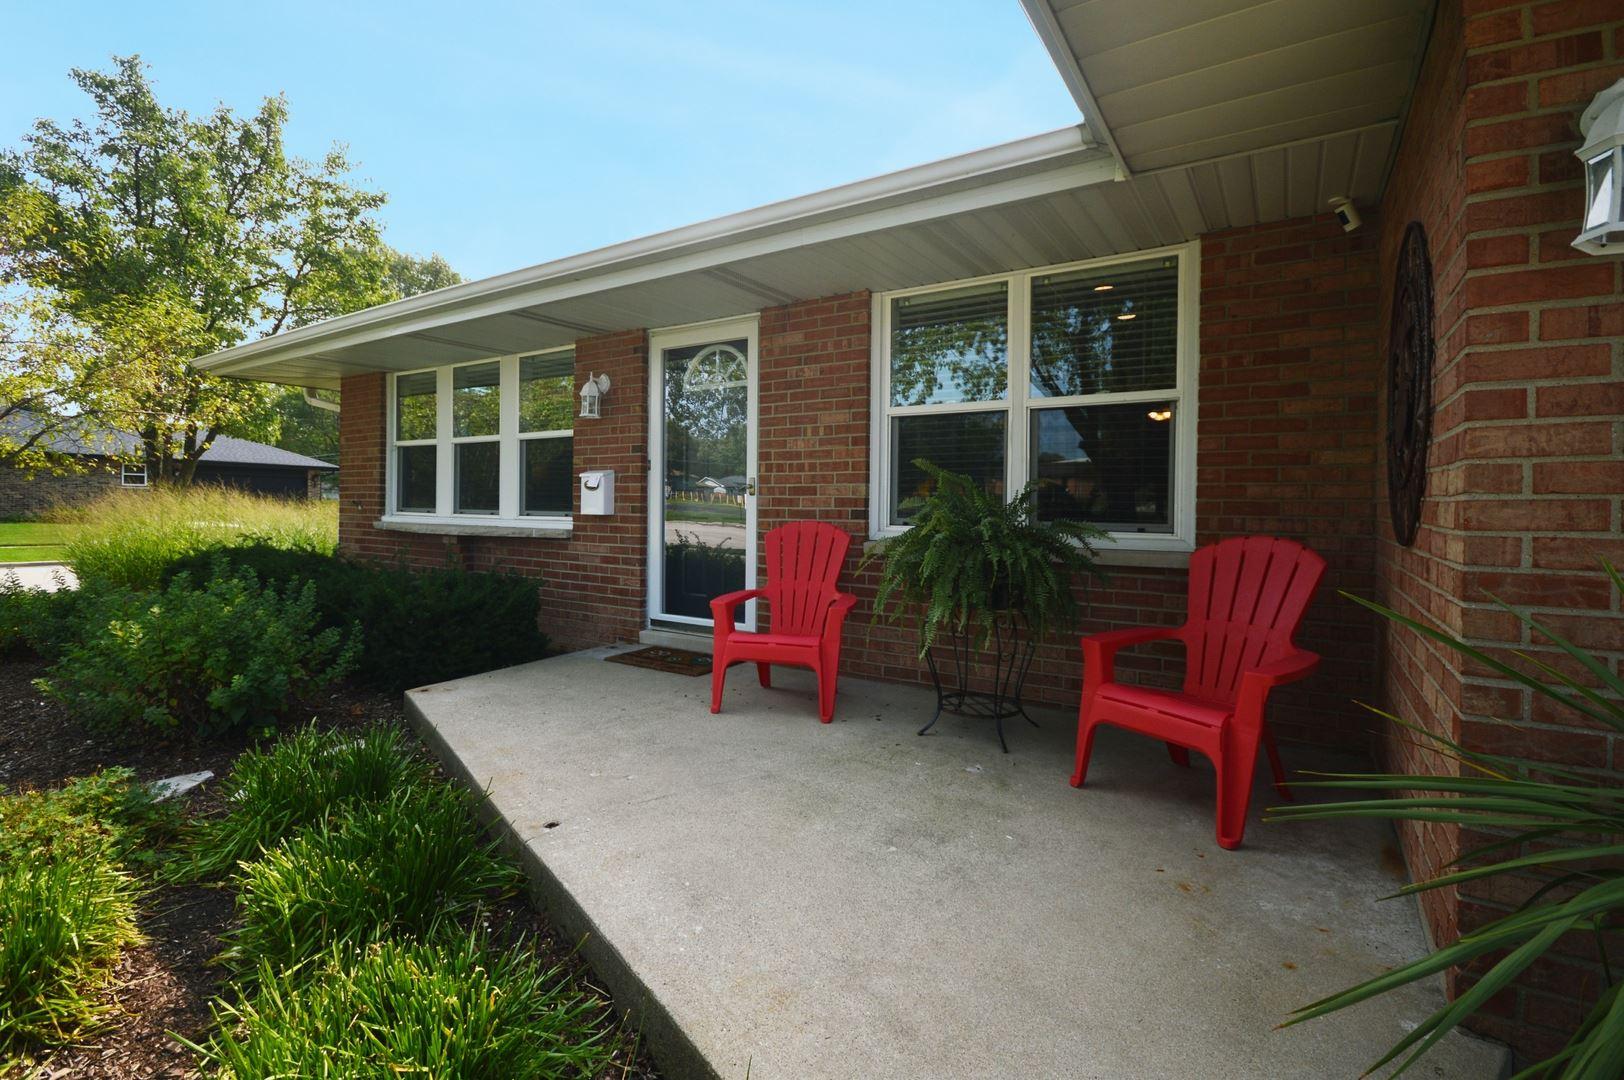 Photo of 2610 Glenwood Avenue, Joliet, IL 60435 (MLS # 10863479)